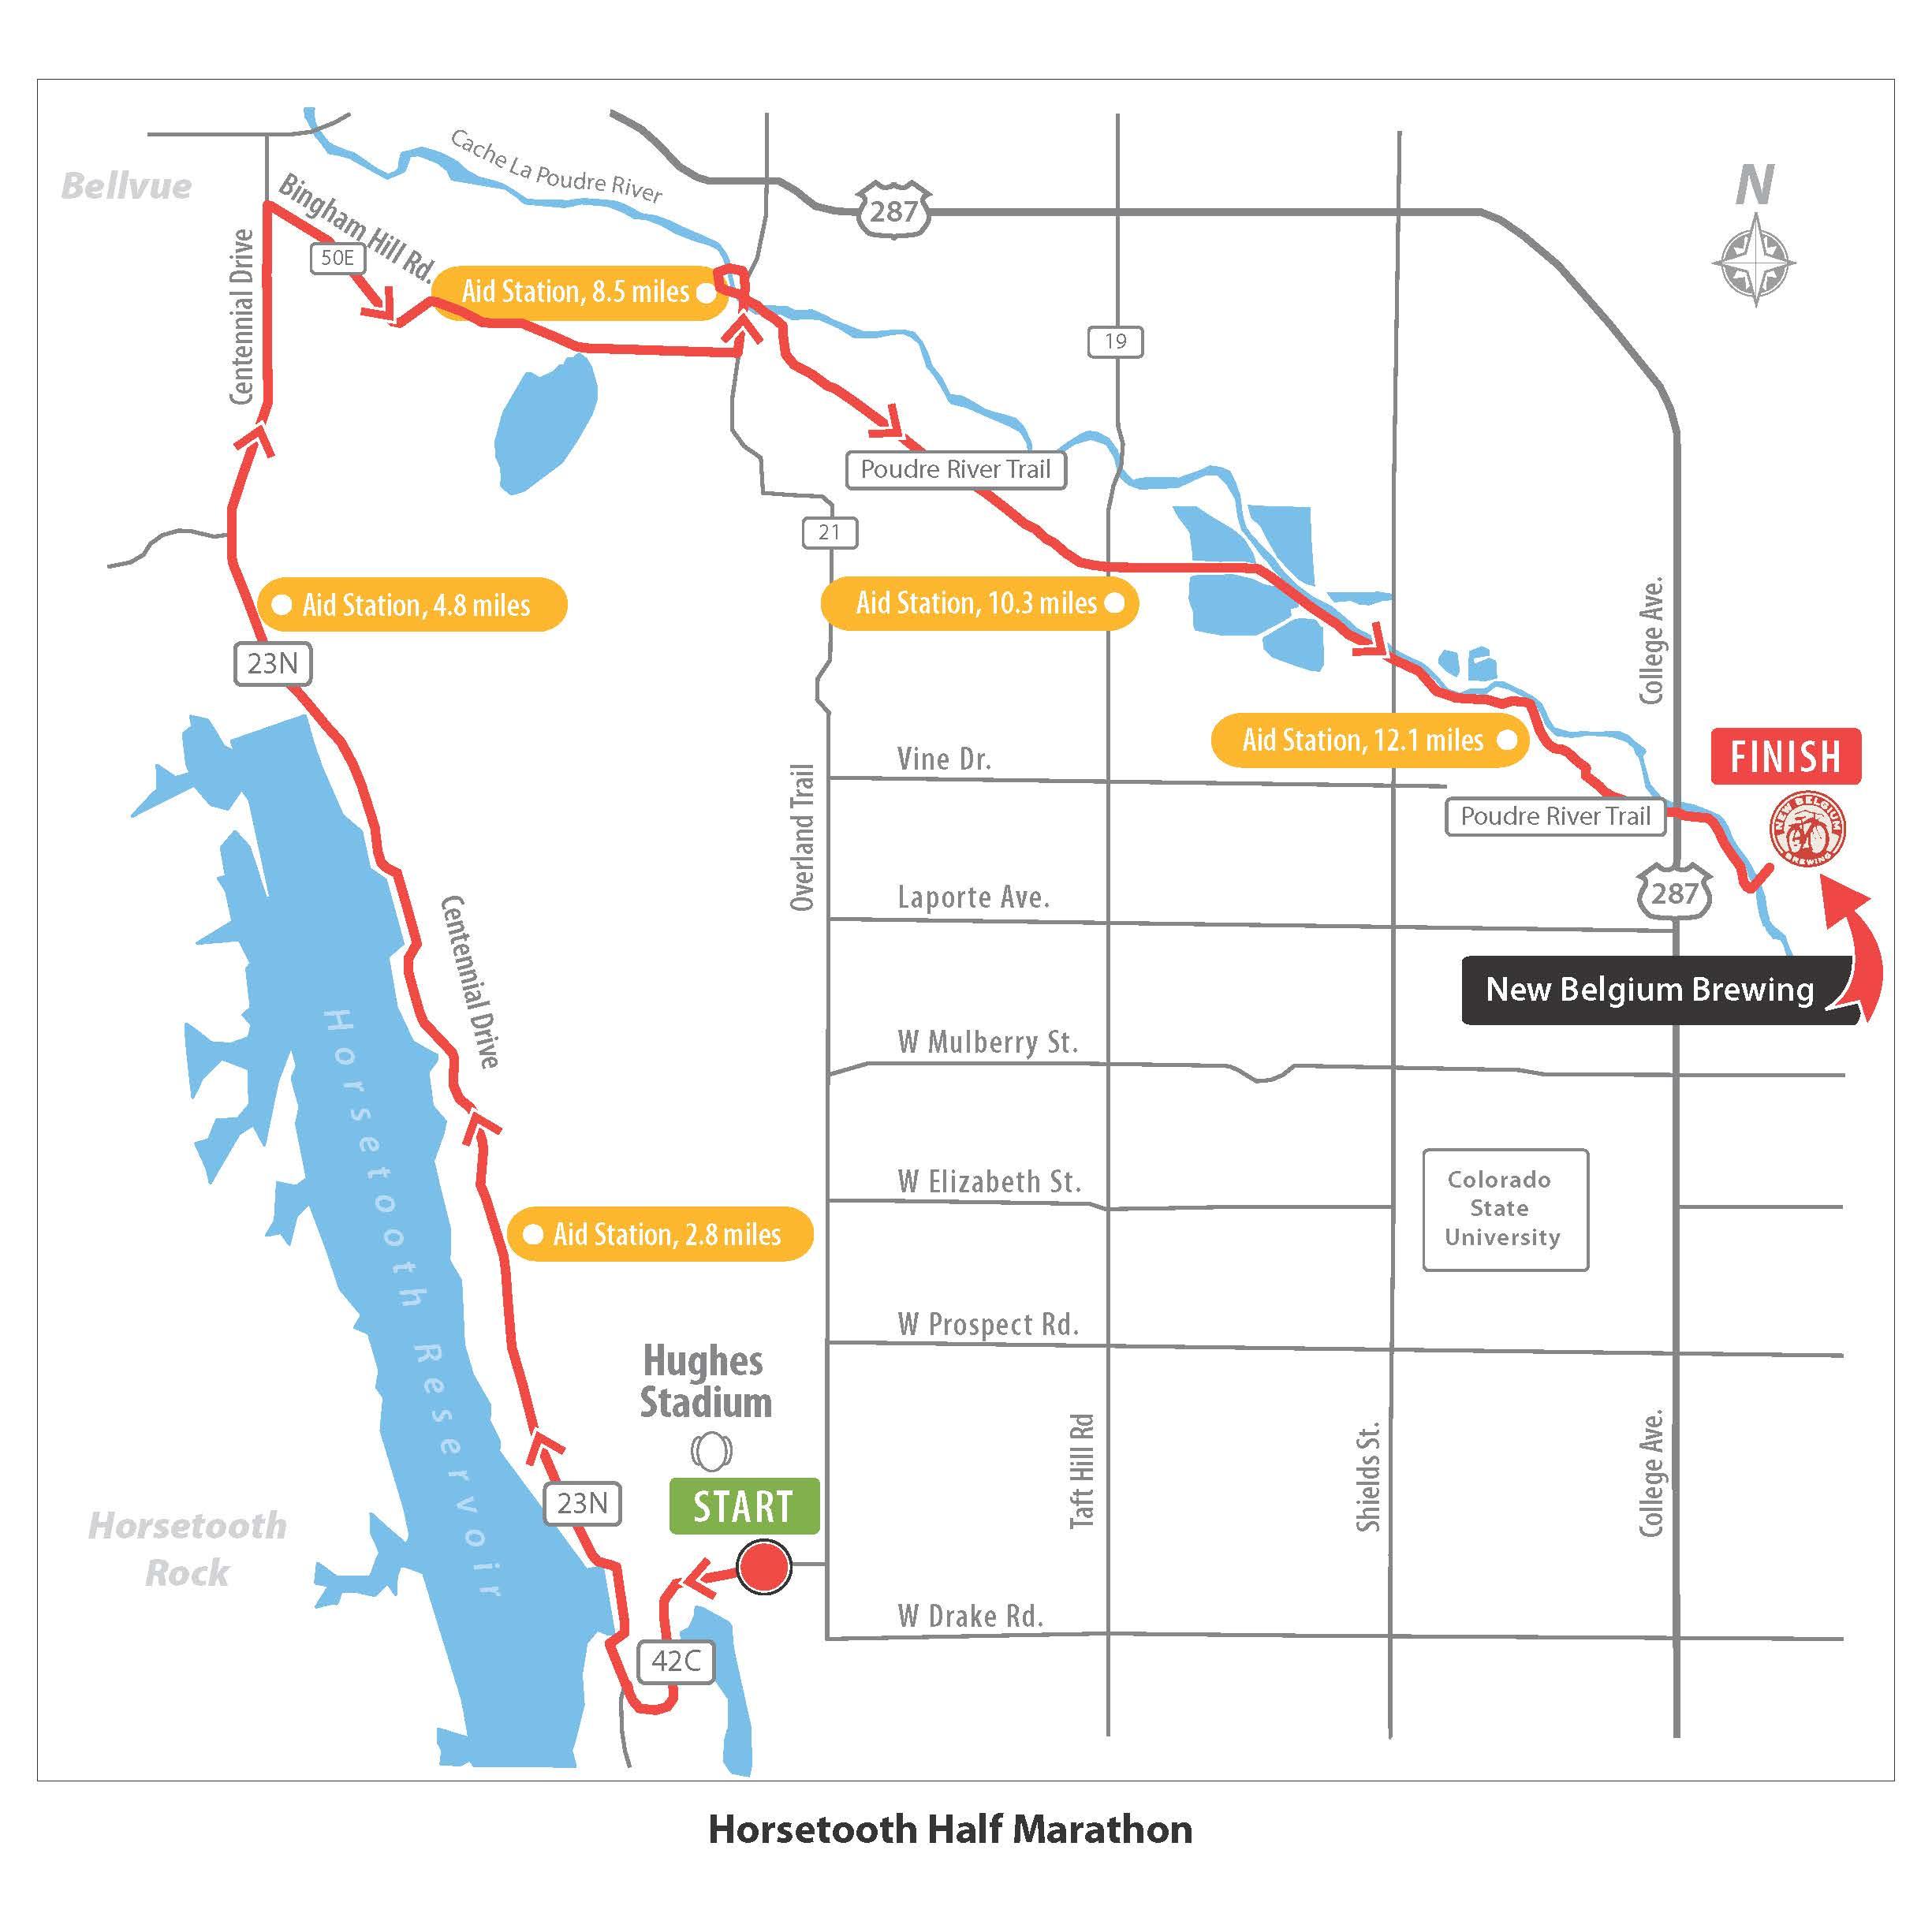 Horsetooth Half Marathon Course Map